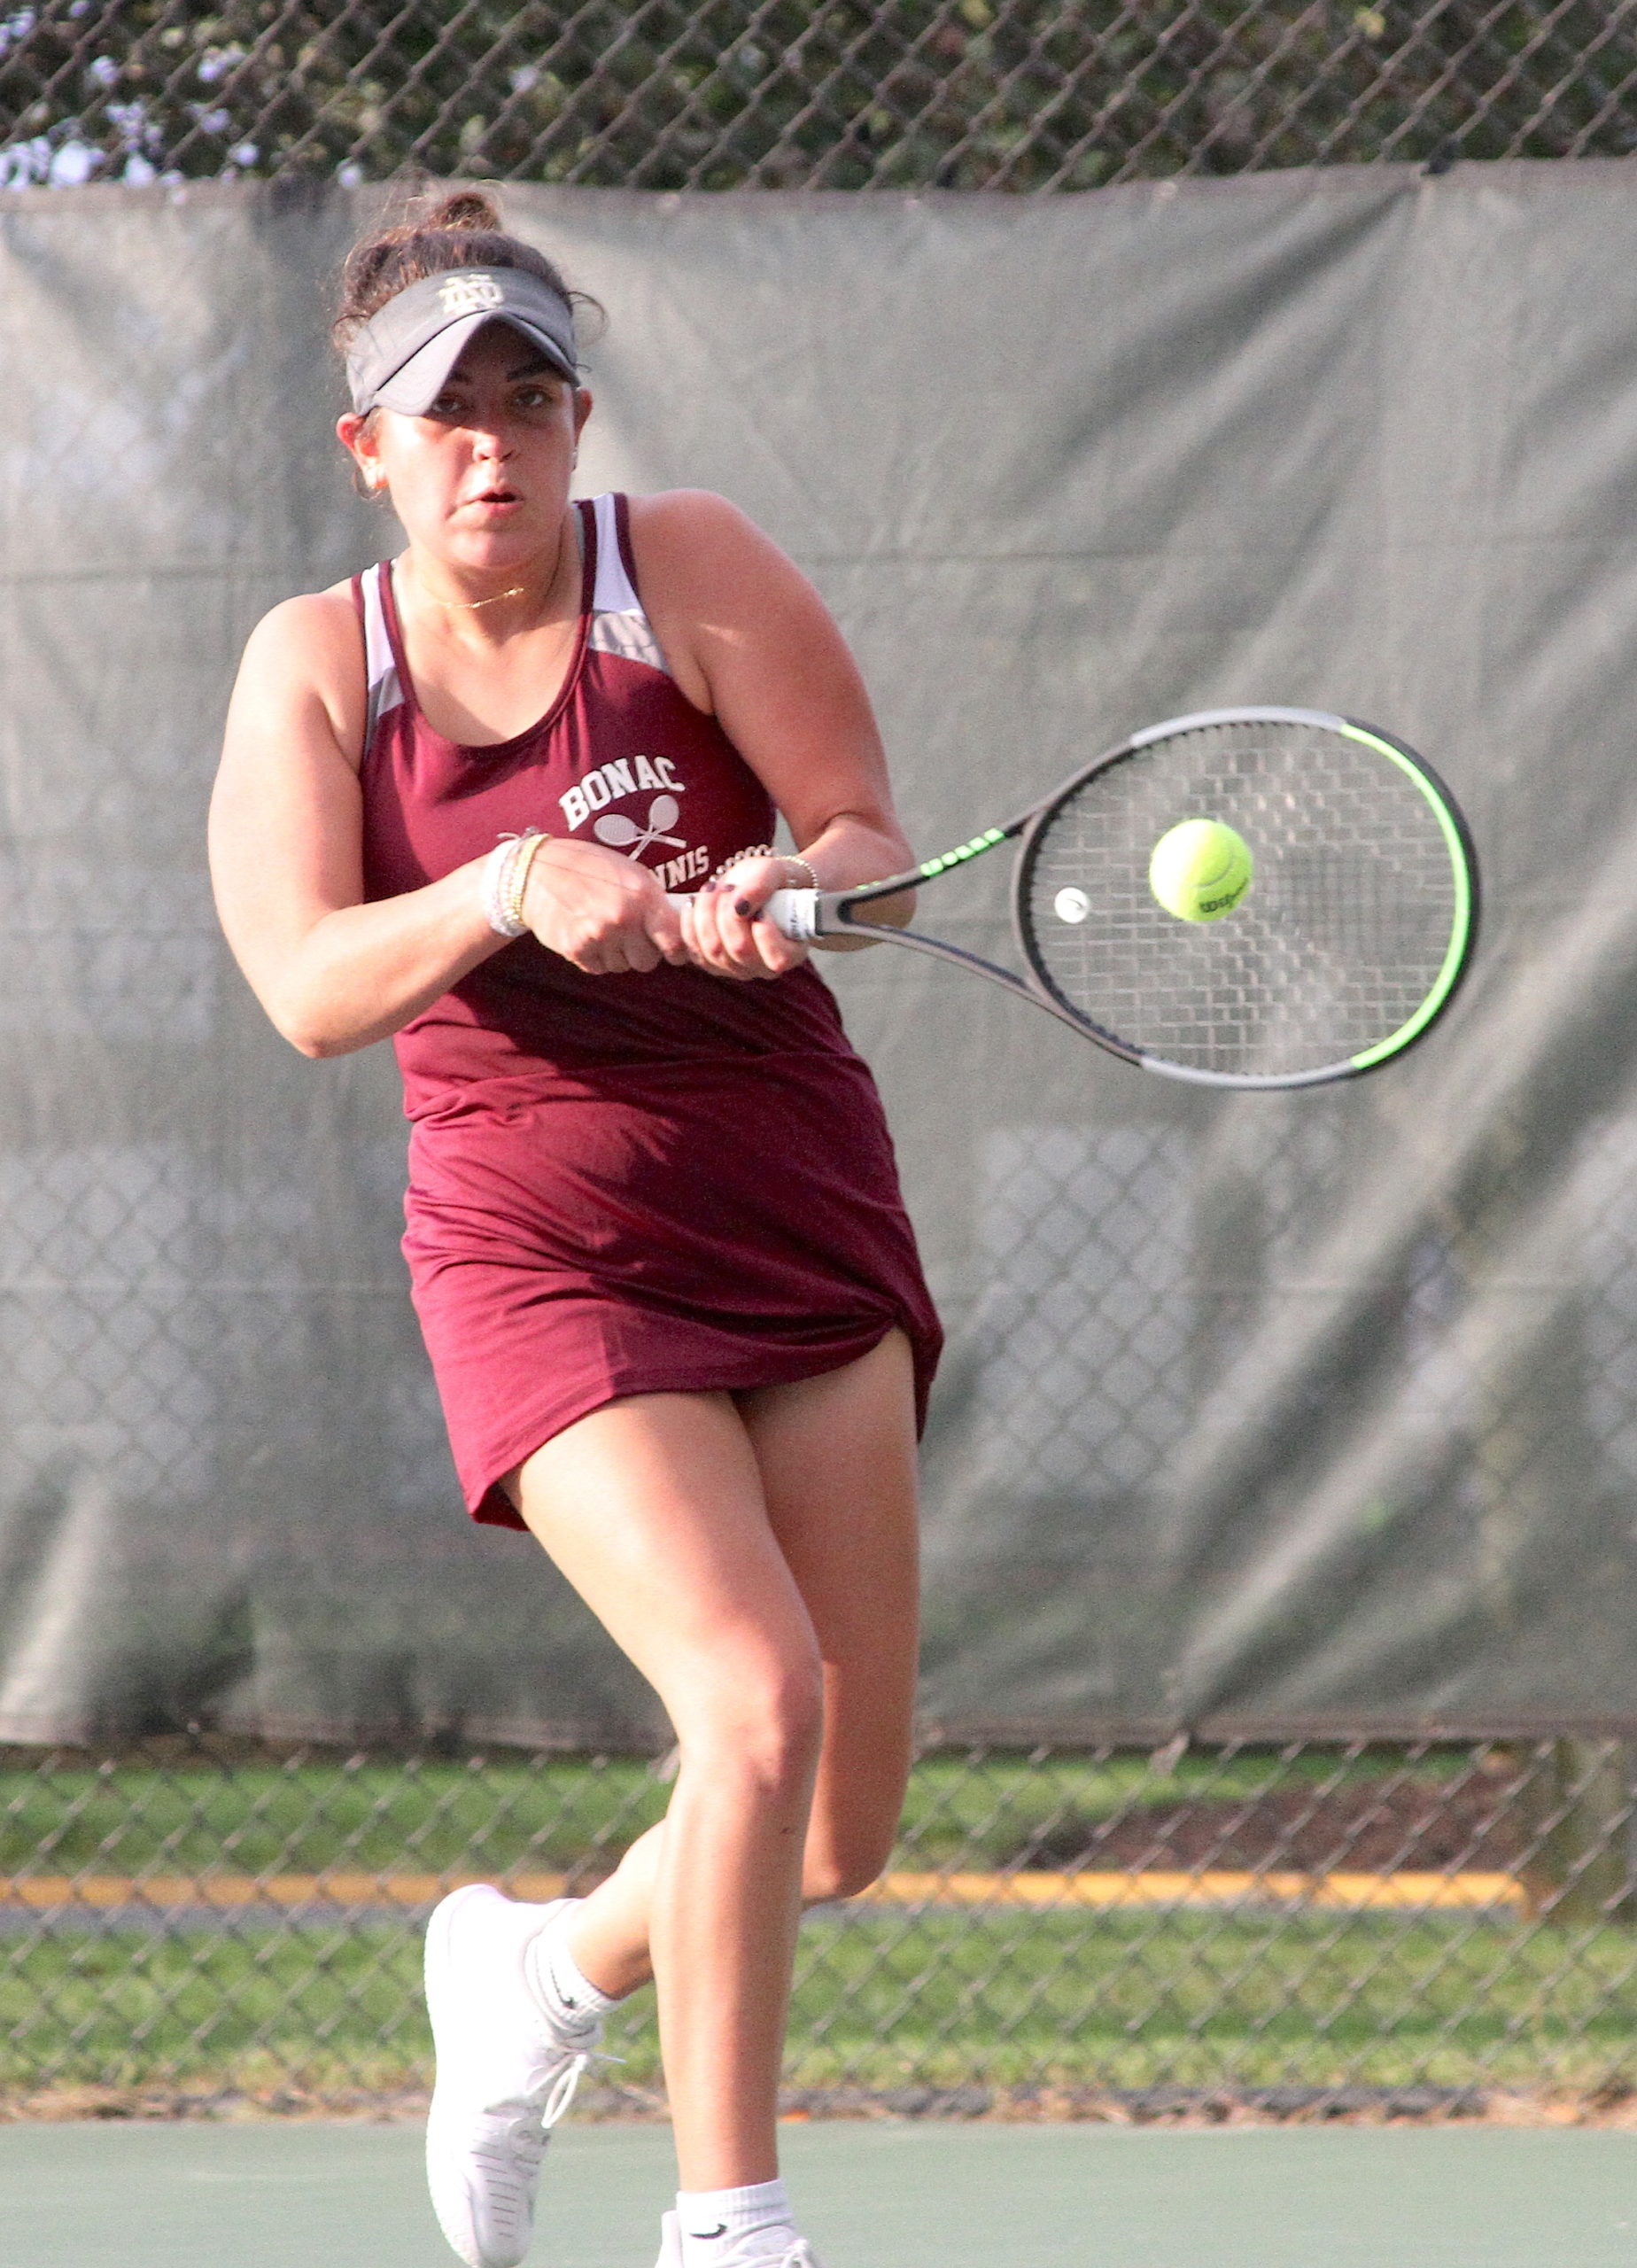 Pierson senior Sandrine Becht keeps a volley going for East Hampton at No. 1 singles. DESIRÉE KEEGAN